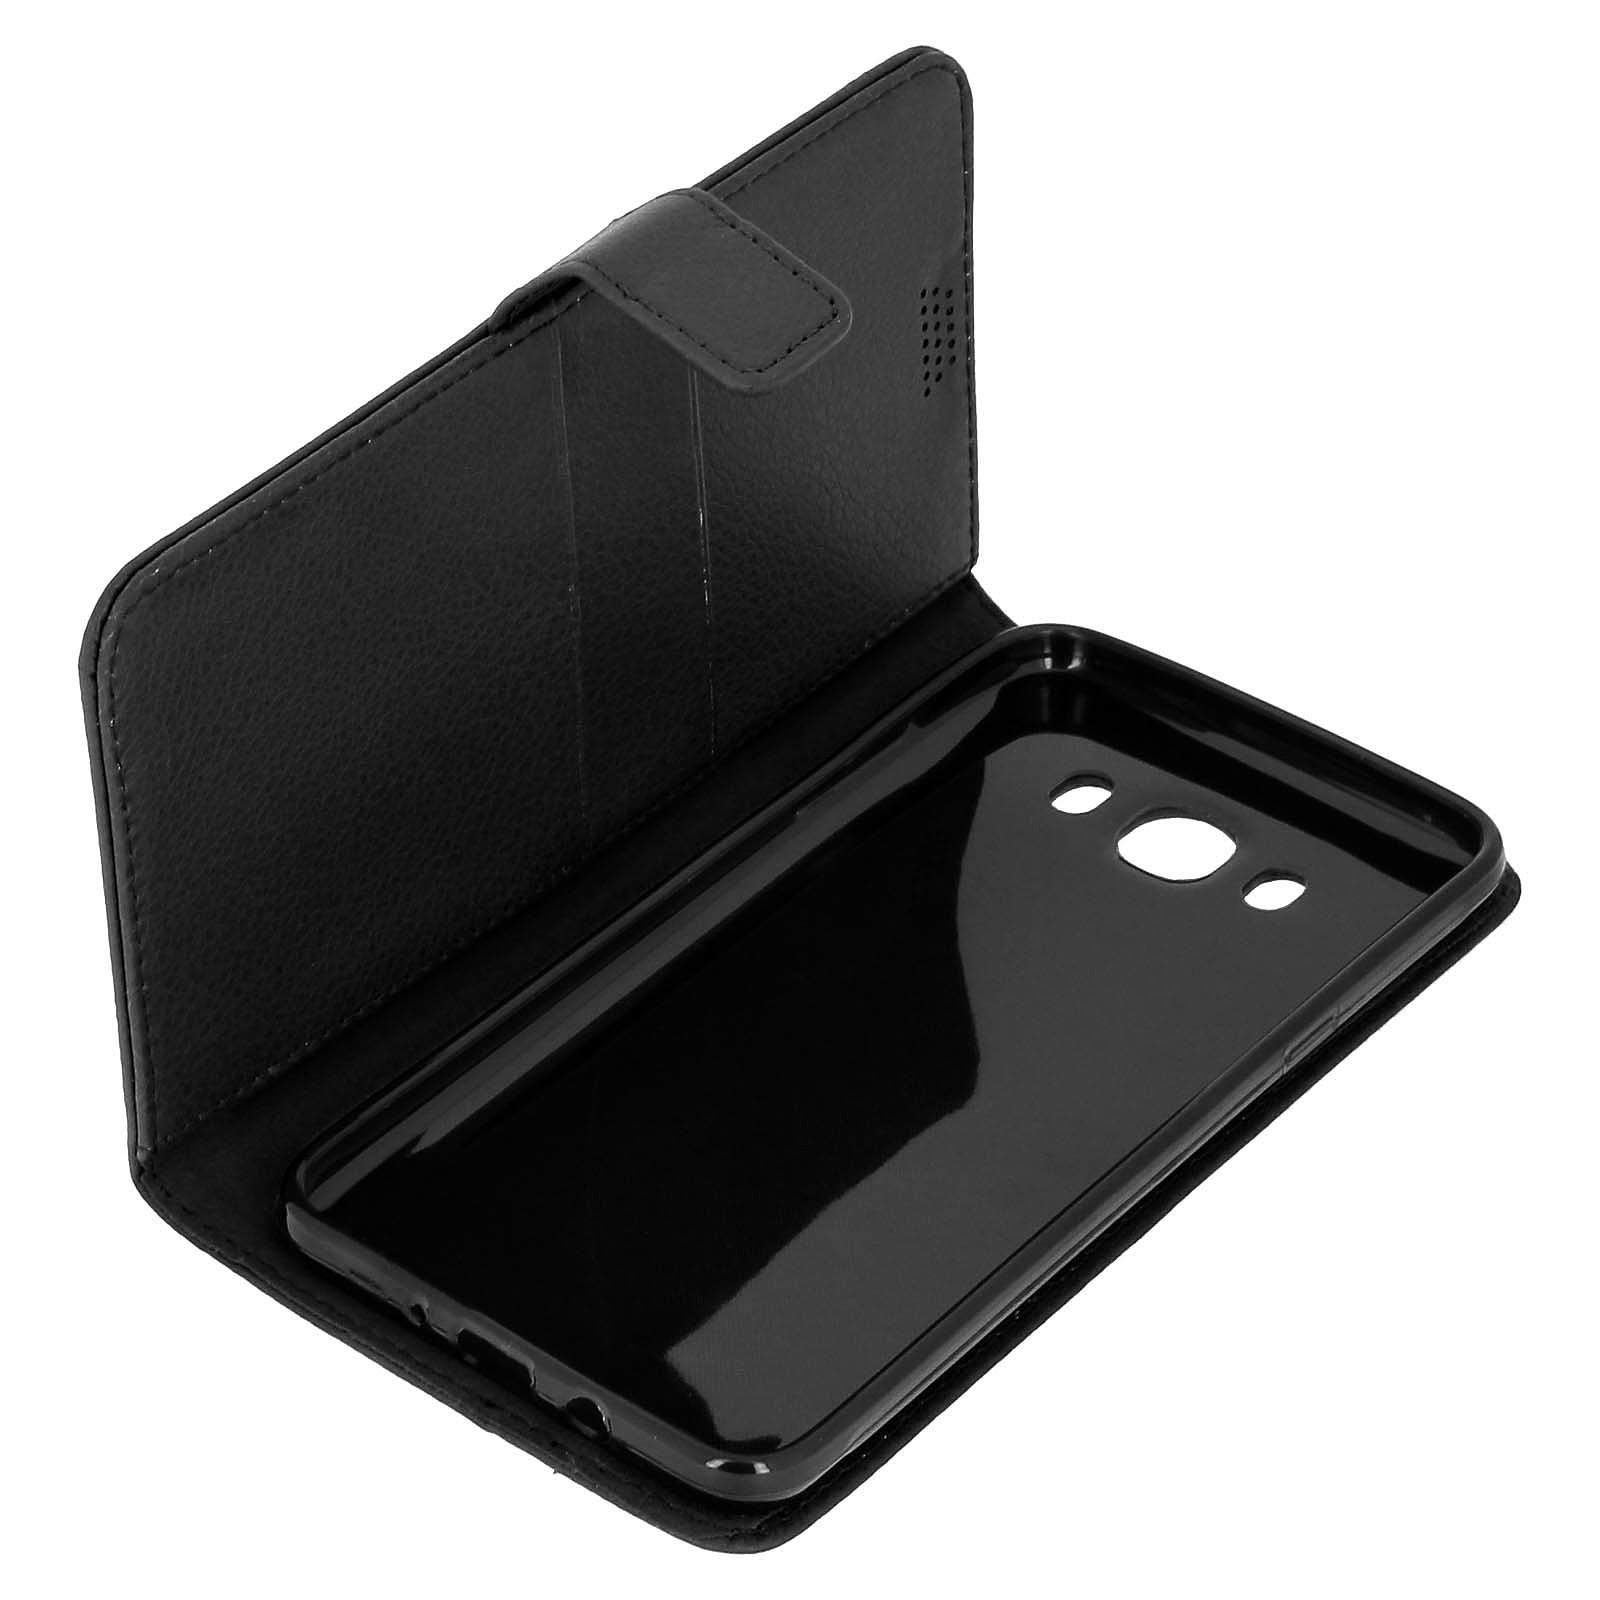 Avizar Etui folio Noir pour Samsung Galaxy J7 2016